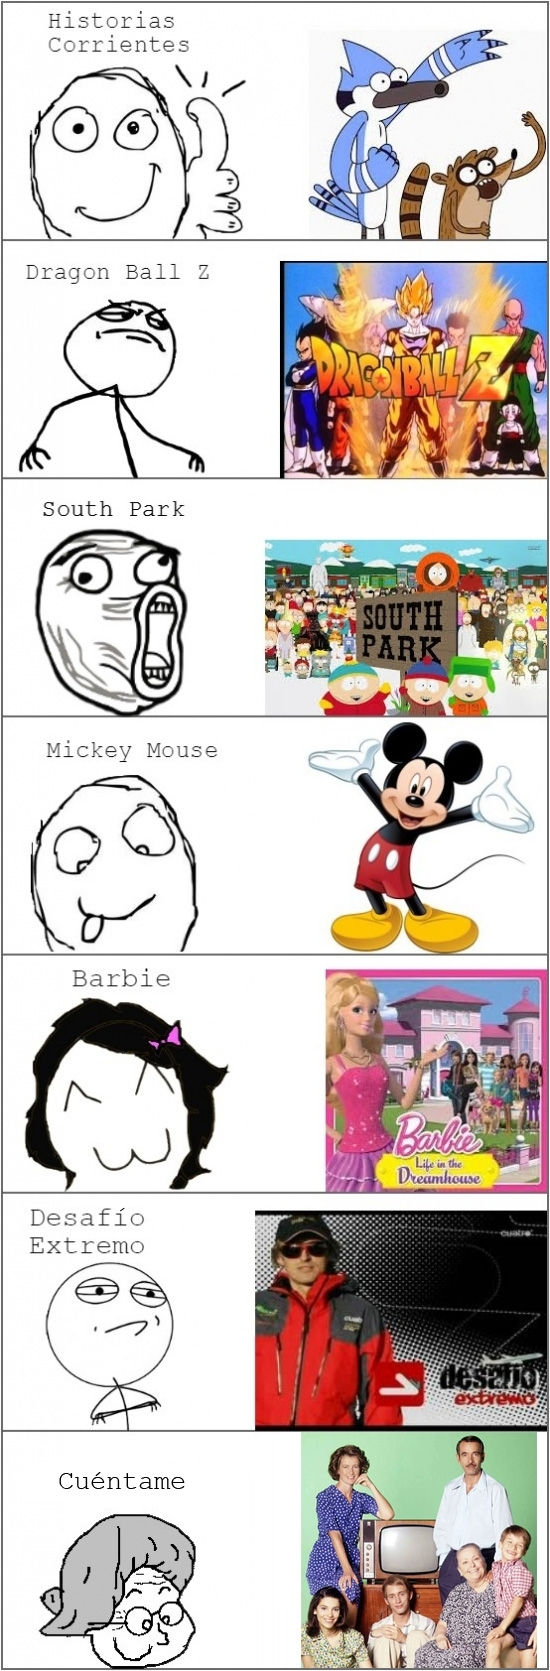 Mix - Todo meme tiene su programa de tele favorito